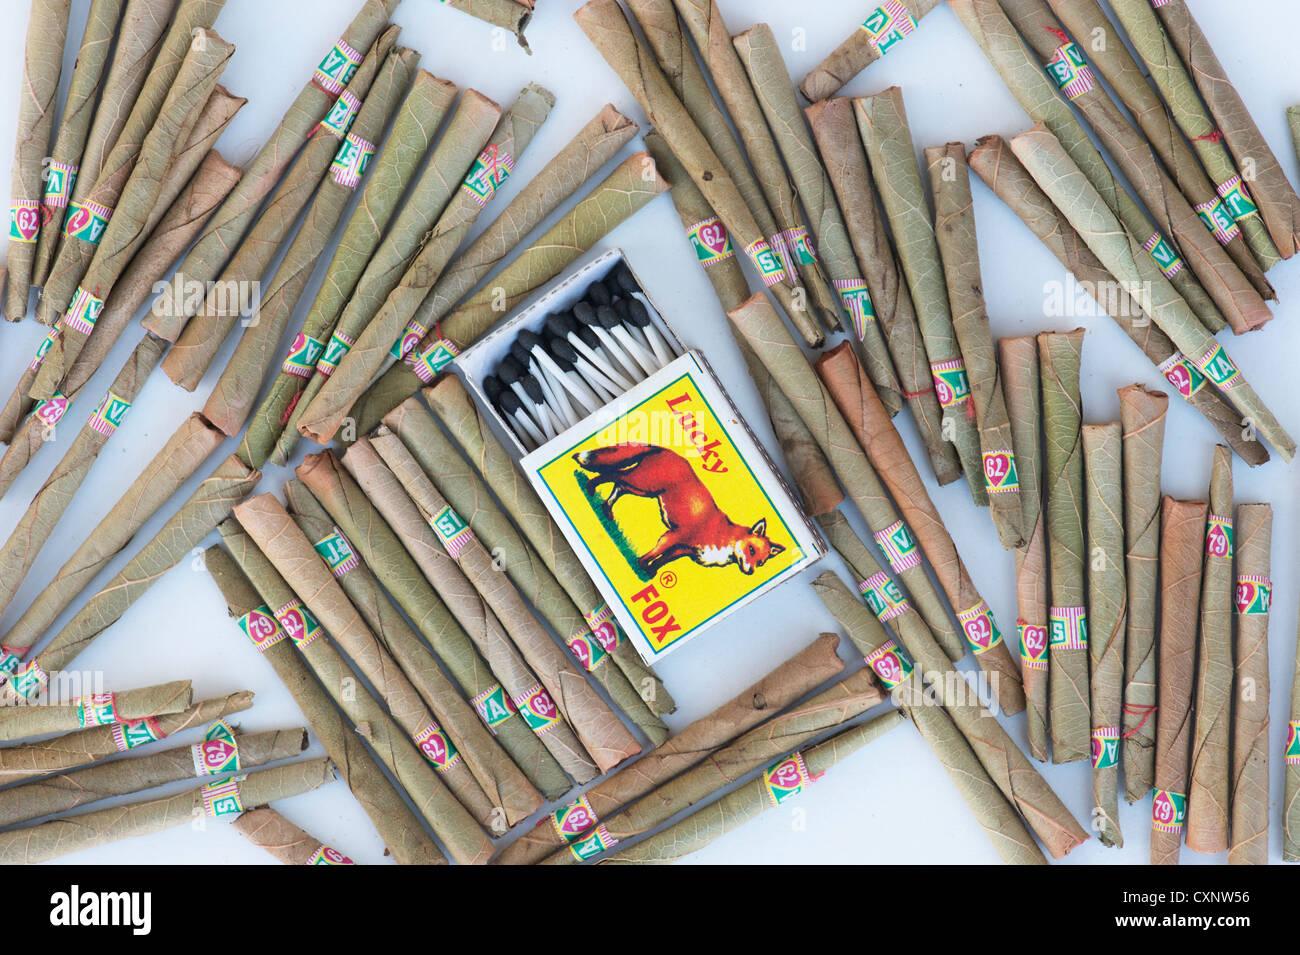 Smoking Beedi Stock Photos & Smoking Beedi Stock Images